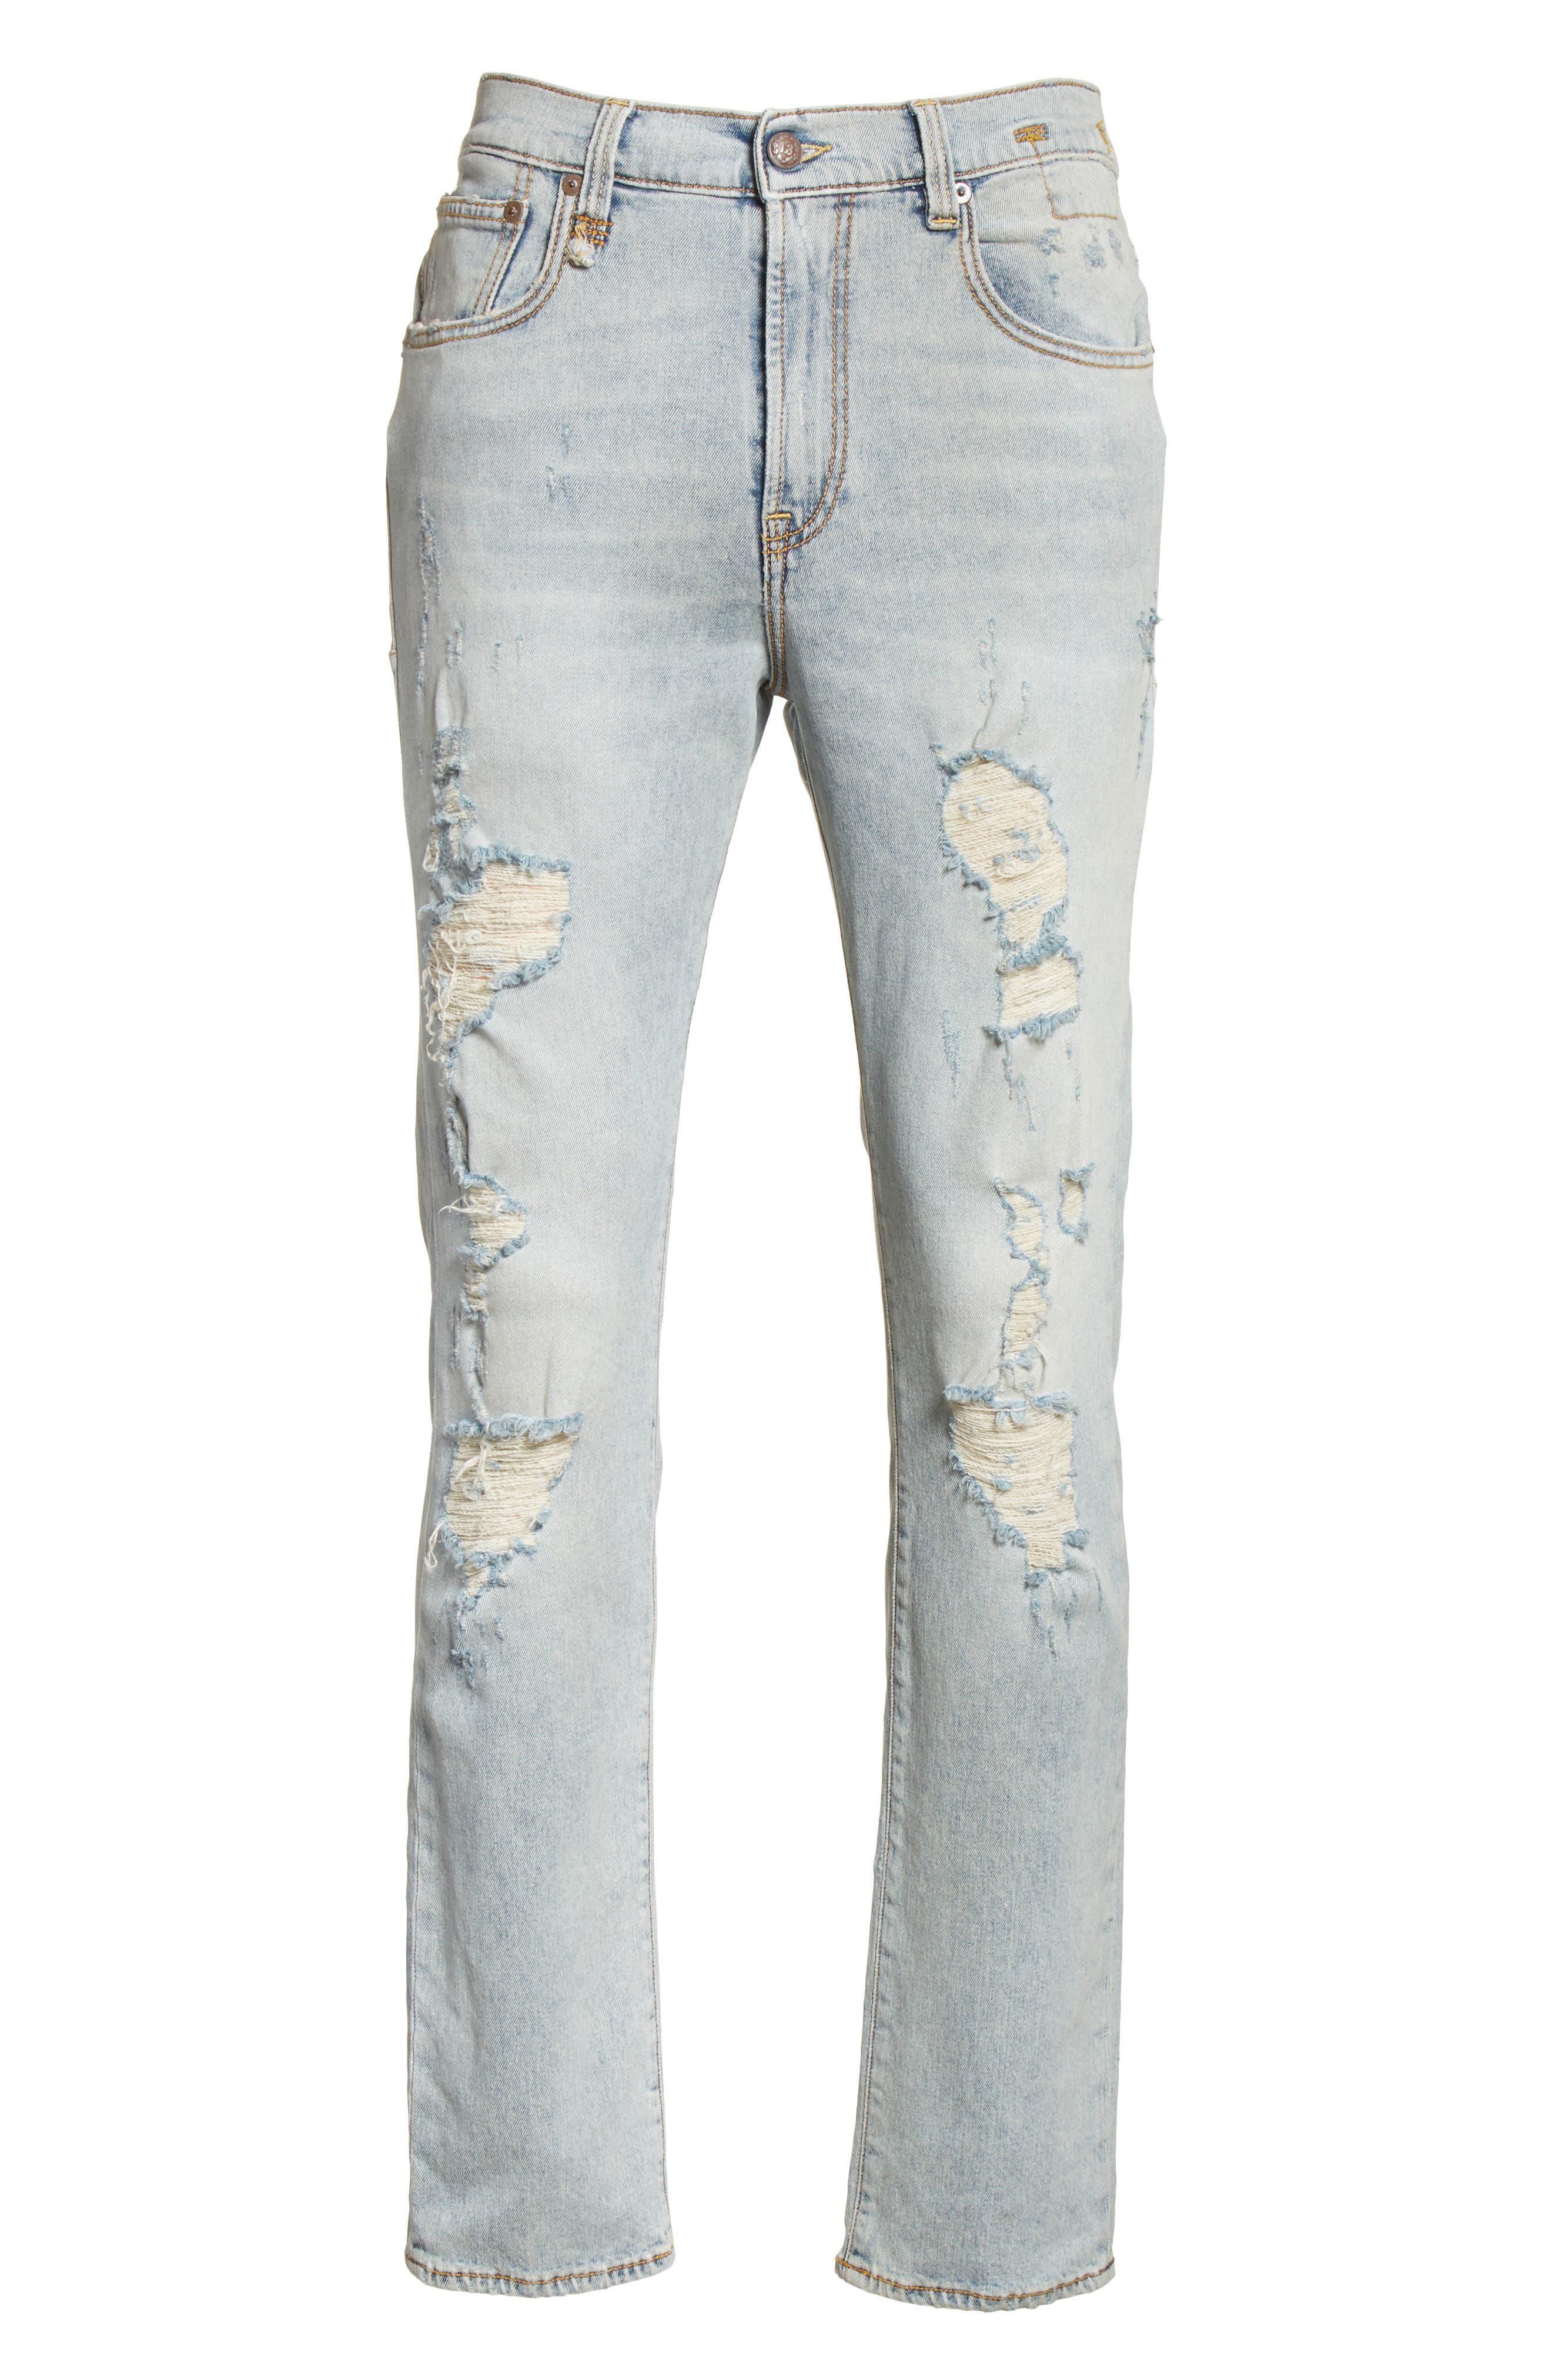 Skate Destroyed Jeans,                             Alternate thumbnail 6, color,                             460